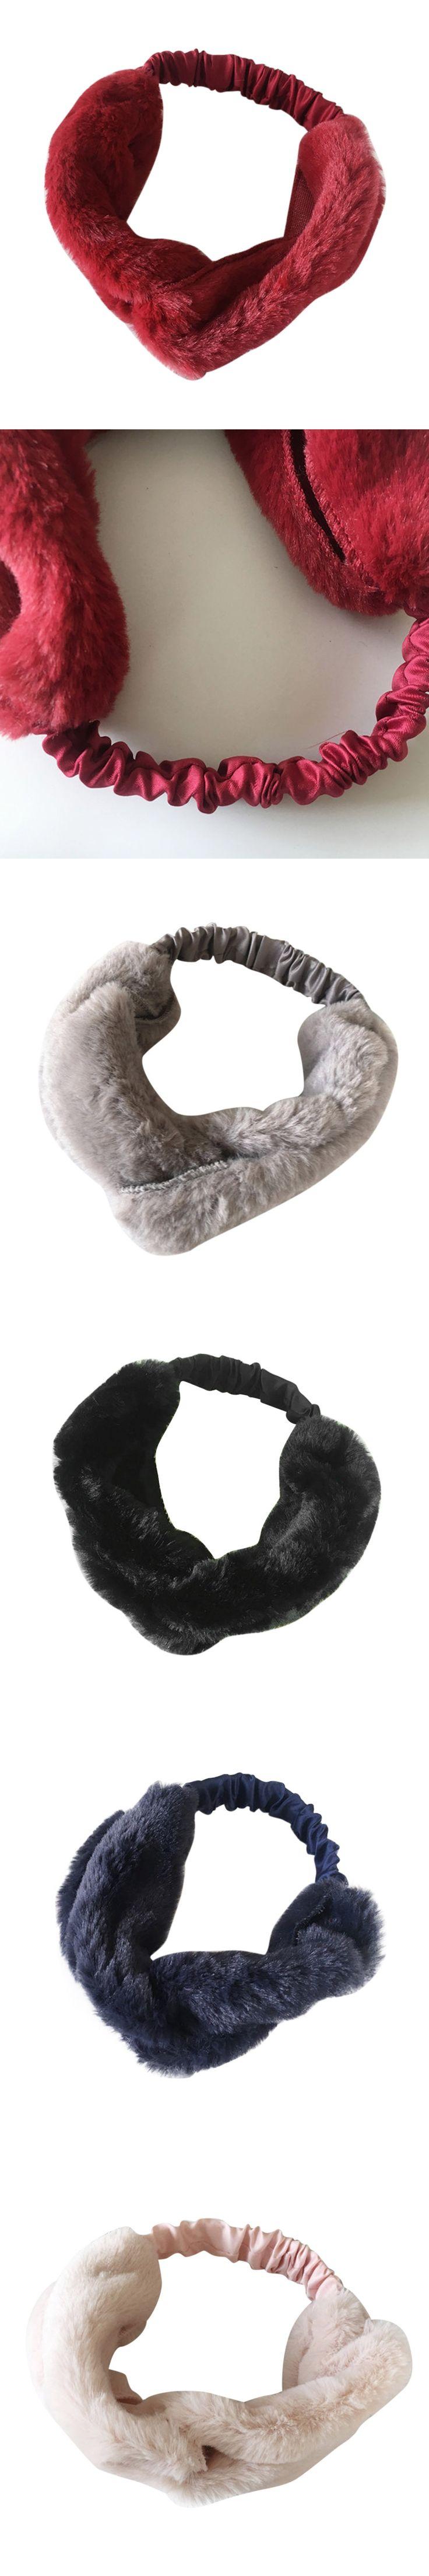 1pc Women Faux Fur Cross Twist Headband Hair Band Turban Soft Elastic Headband Bandage ja30ja9